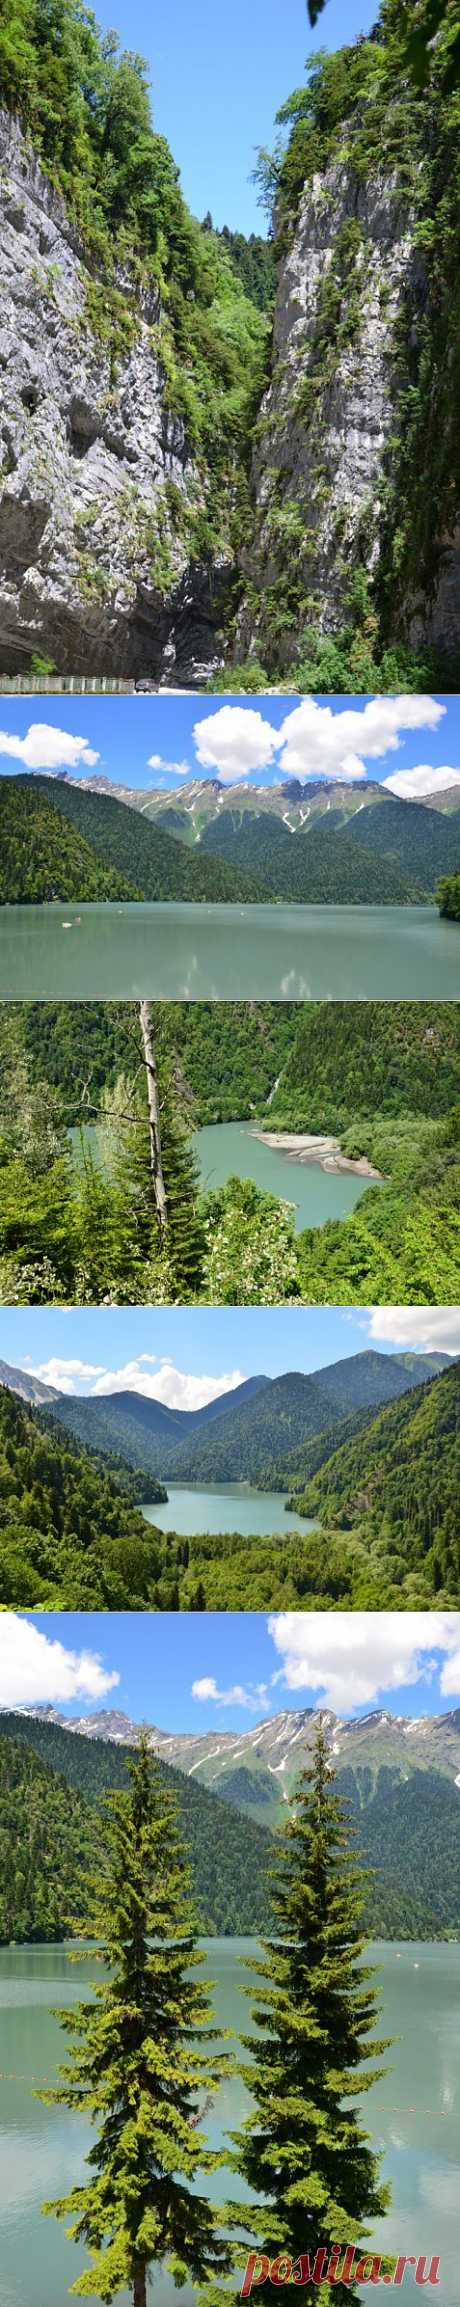 (+1) tema - la bella Montañosa - el lago Ritsa | el Fotoarte